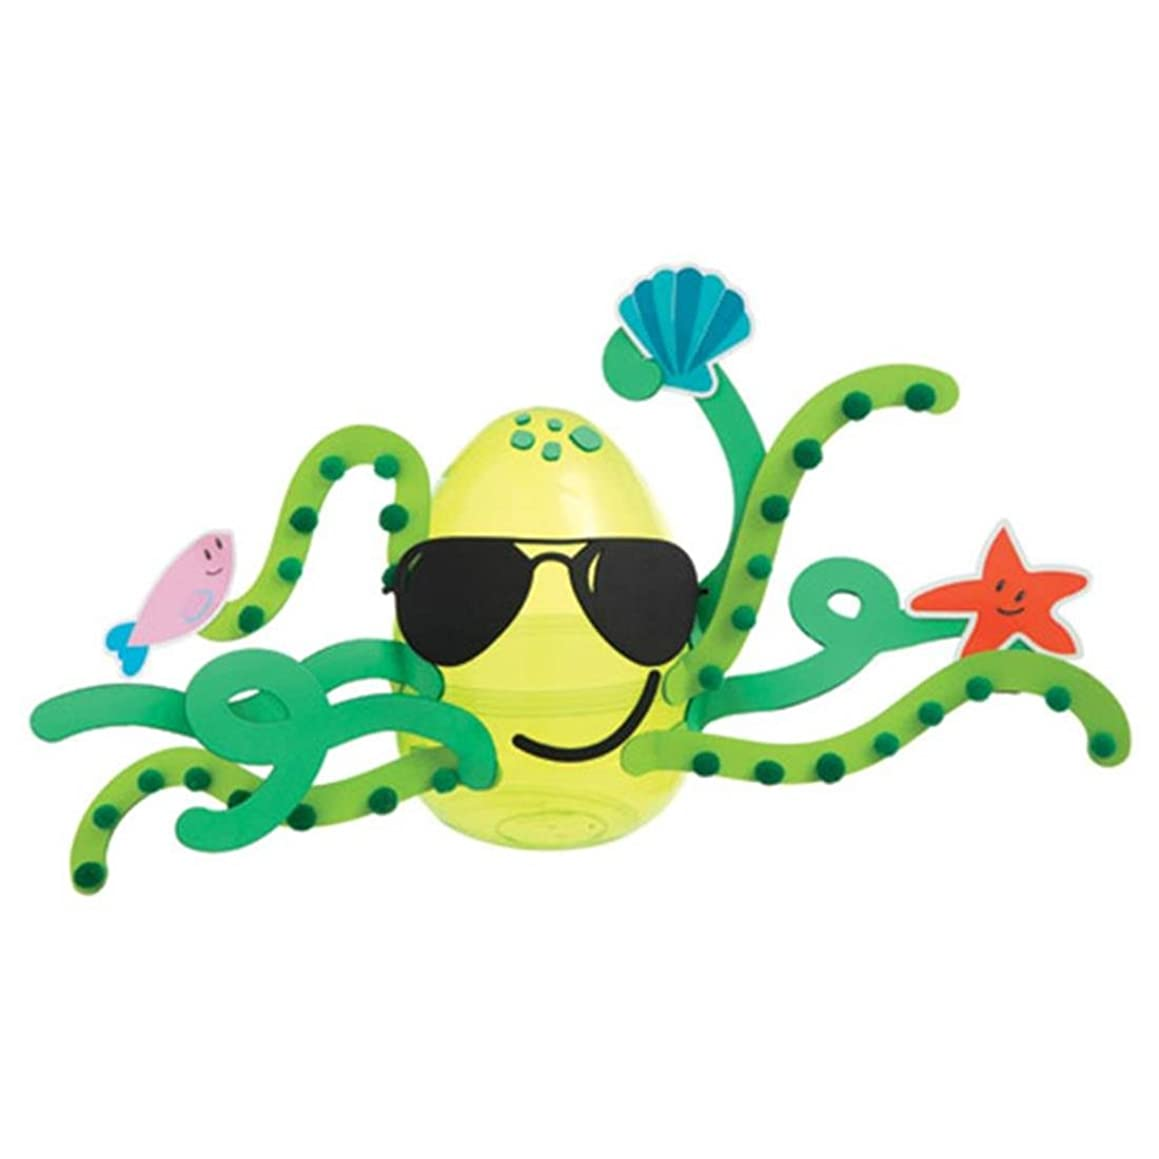 Darice 30023990 Foamies Octopus Egg Kit: Plastic/Foam-4.75 x 7.5